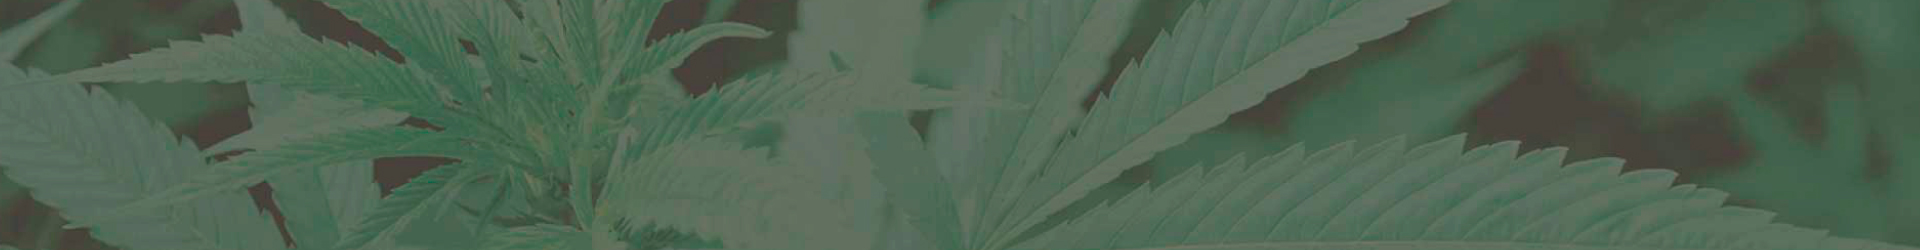 Cabecera cultivando medicina. Autocultivo marihuana.